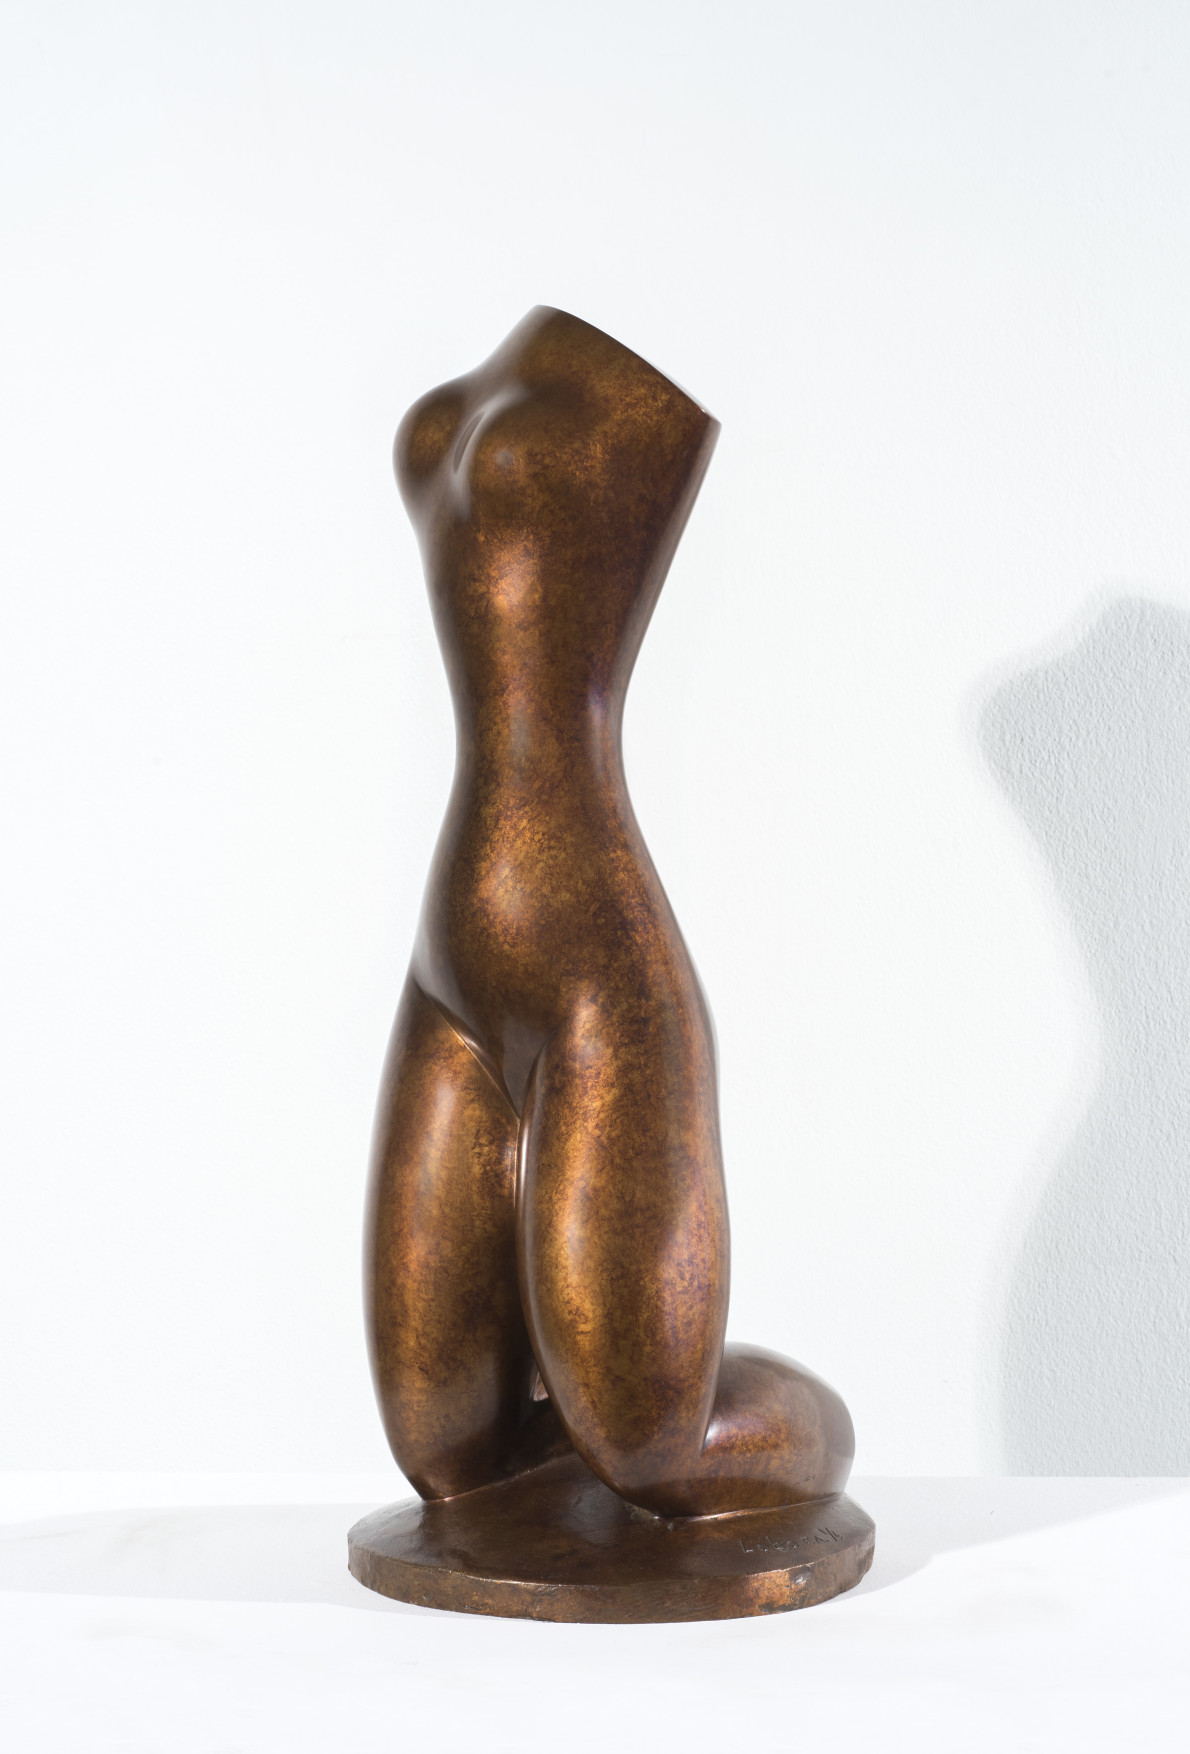 Baltasar Lobo, Torse à genoux, 1976